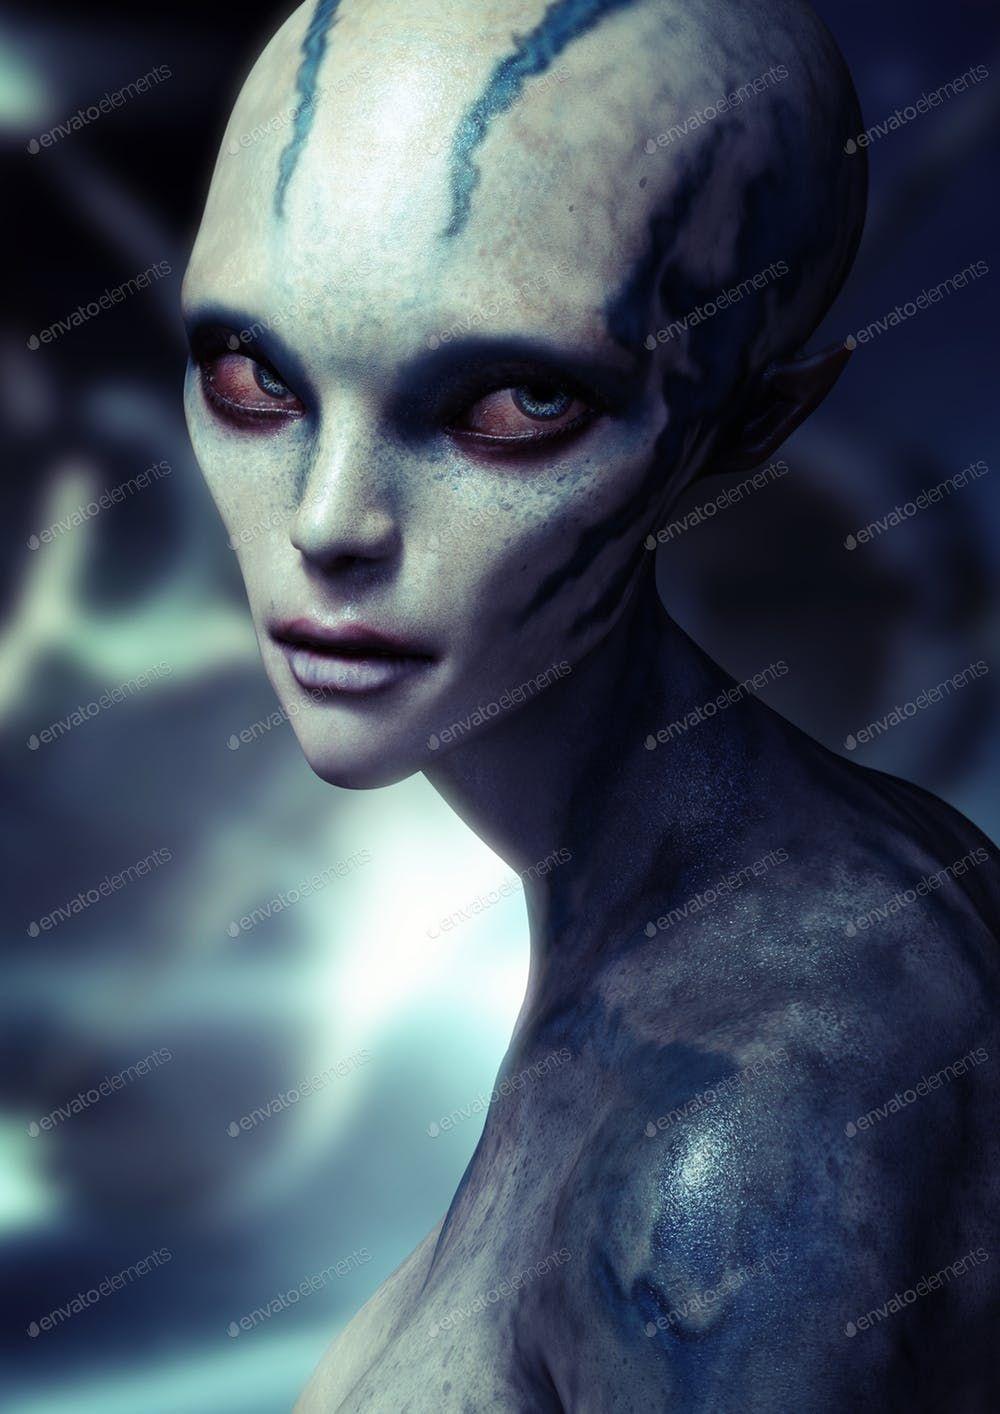 Alien female By digitalstormcinema鈥檚 photos